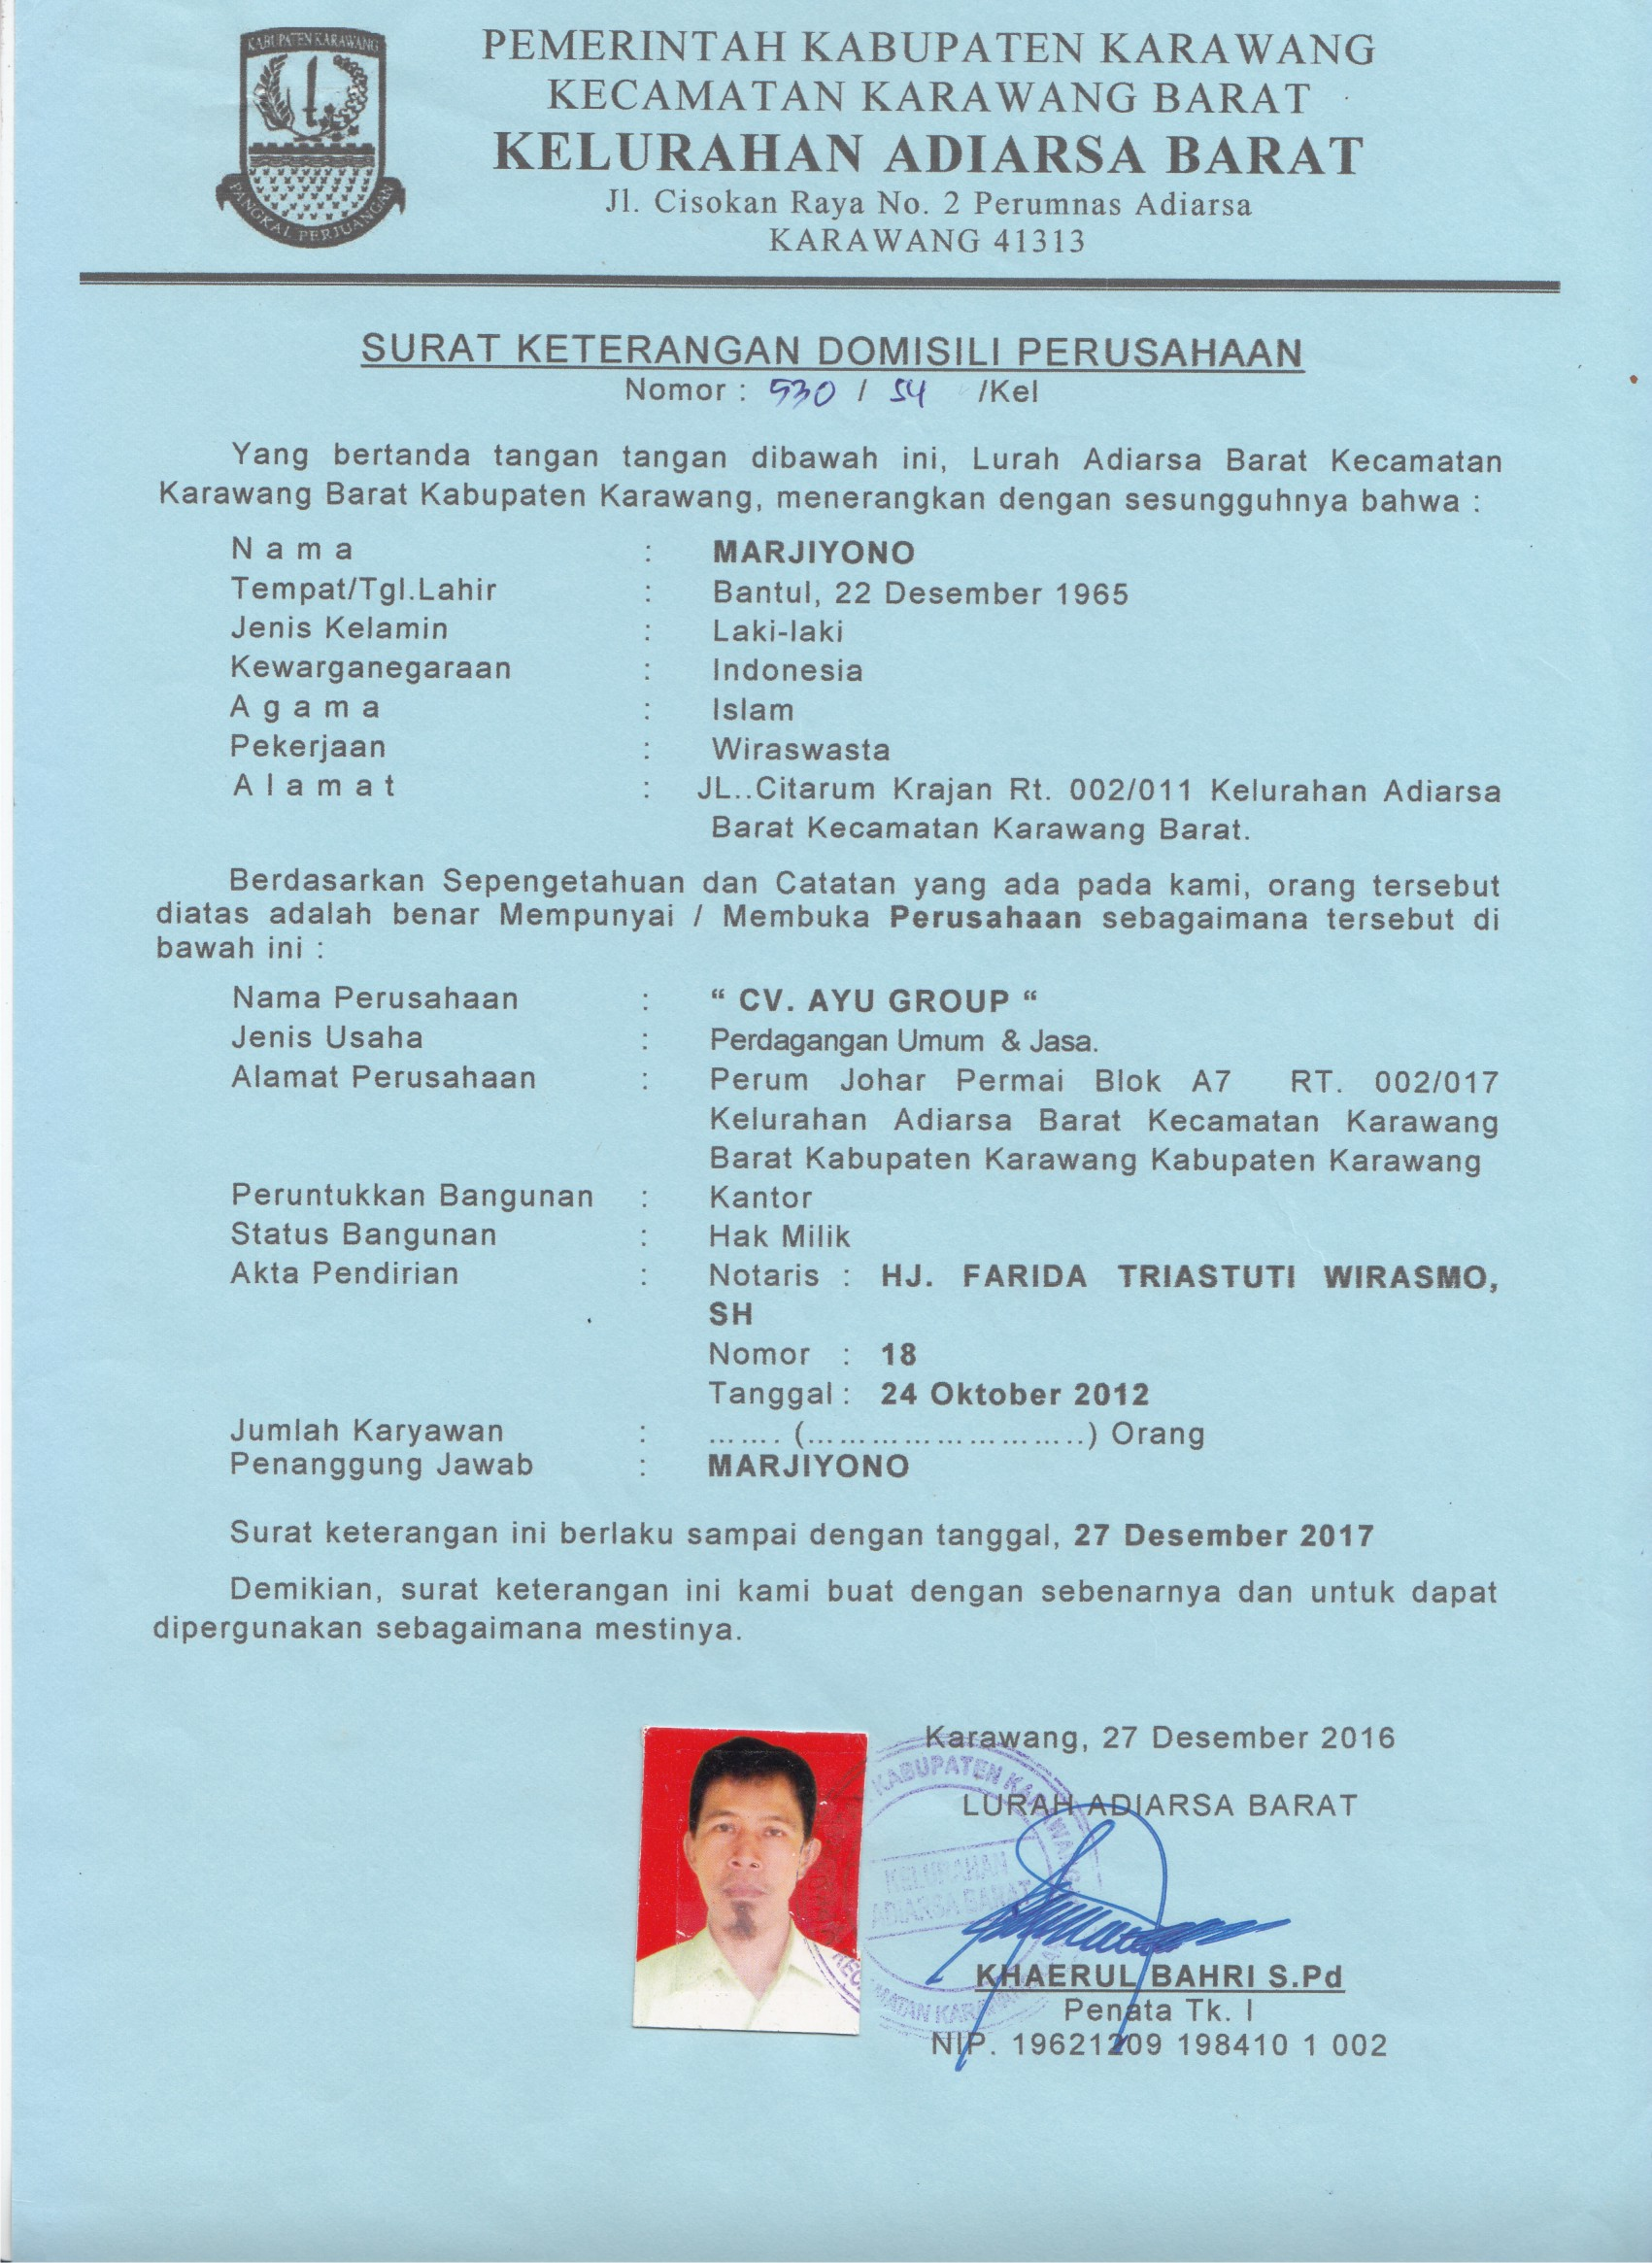 Dokumen Legalitas CV Ayu Group Domisili